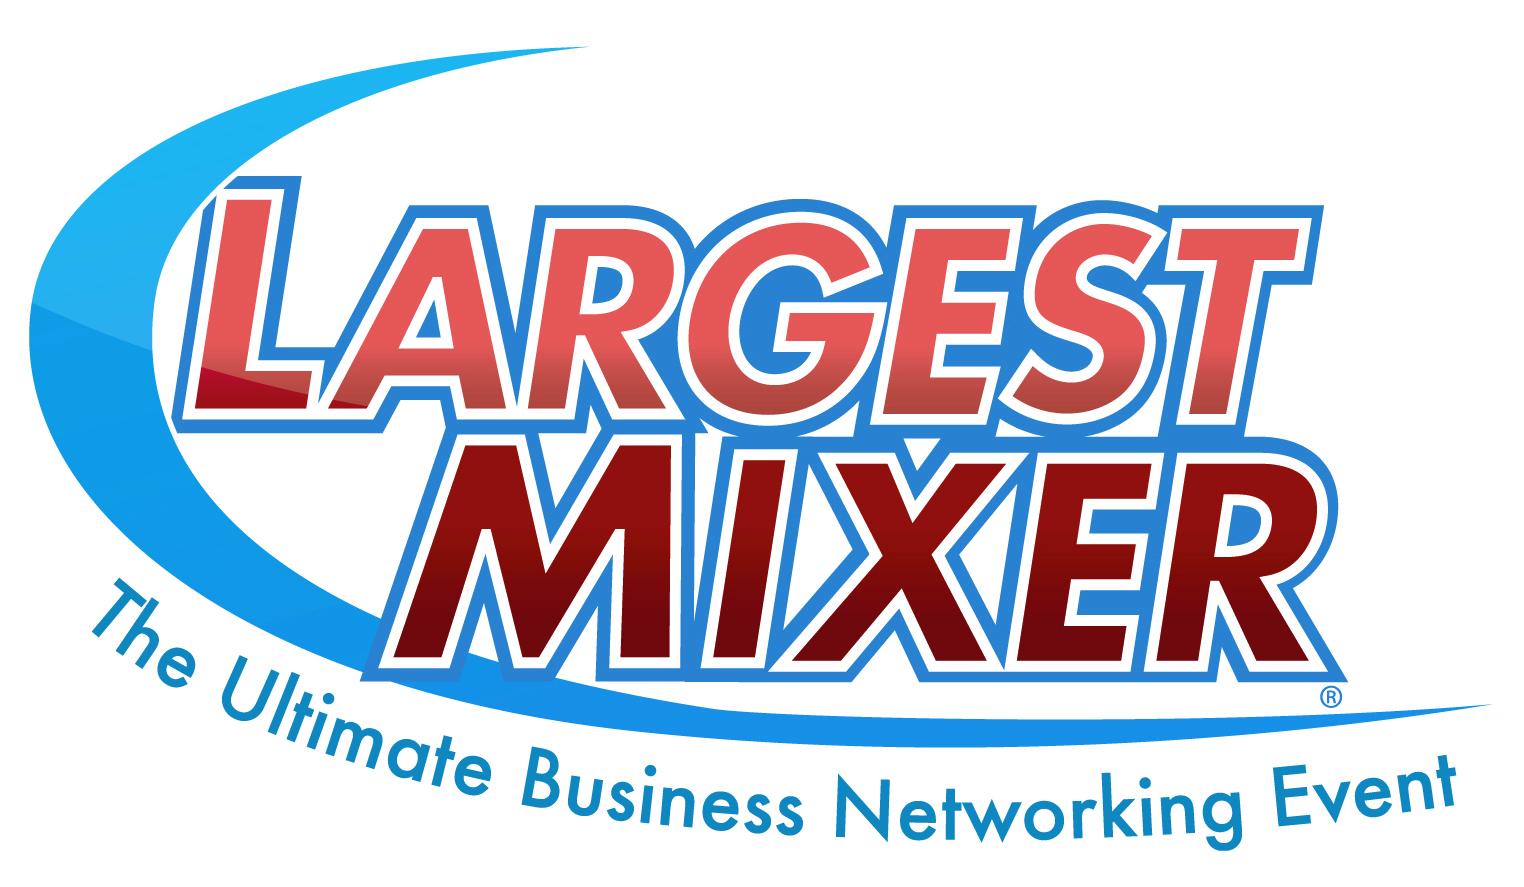 Largest Mixer